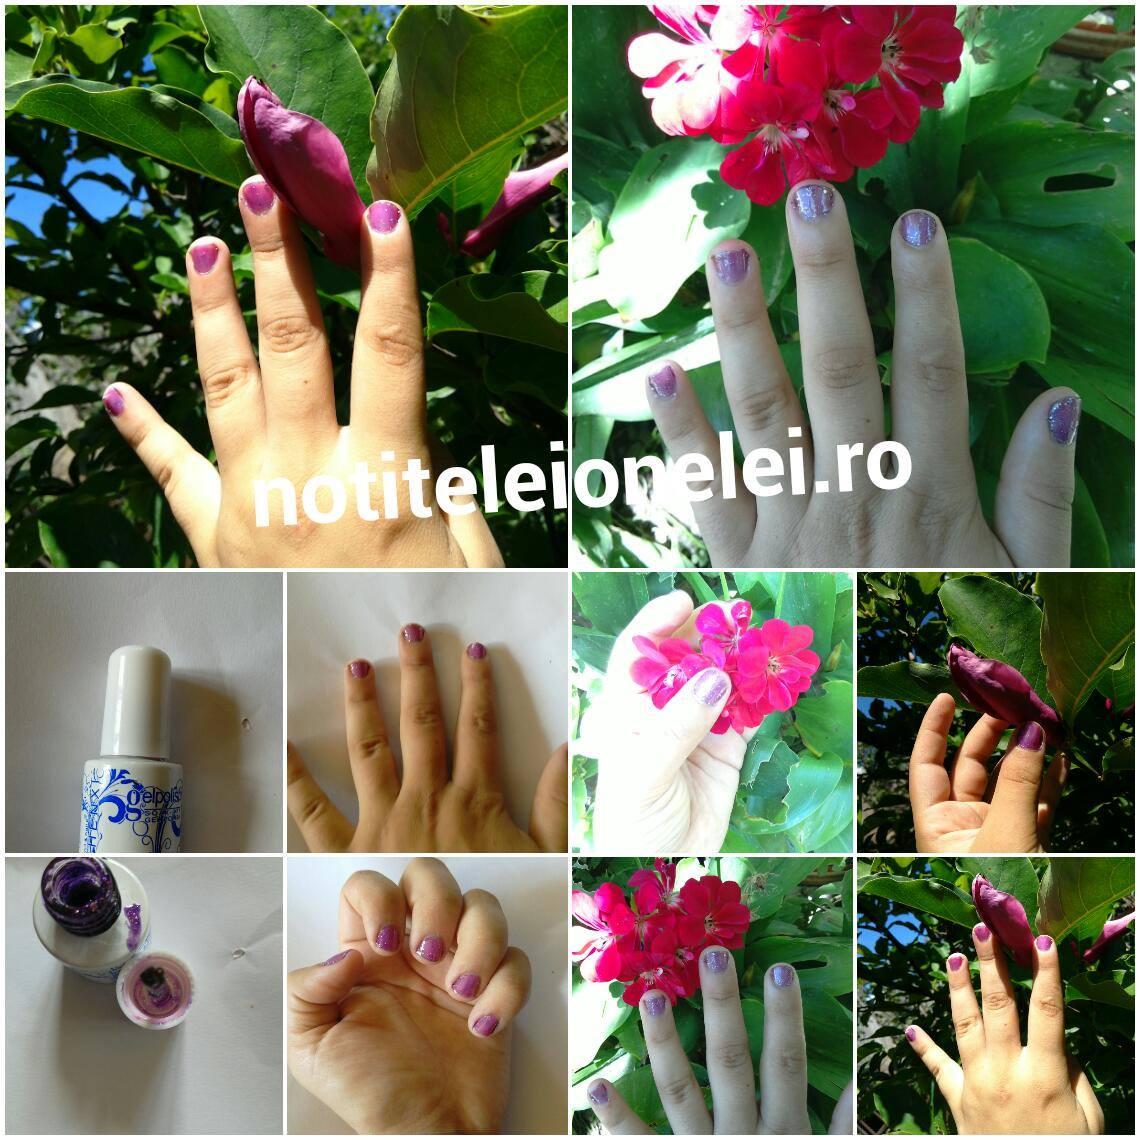 28 Colors 6ml Soak Off UV Gel Nail Art Polish Shiny Glitter Varnish Newchic